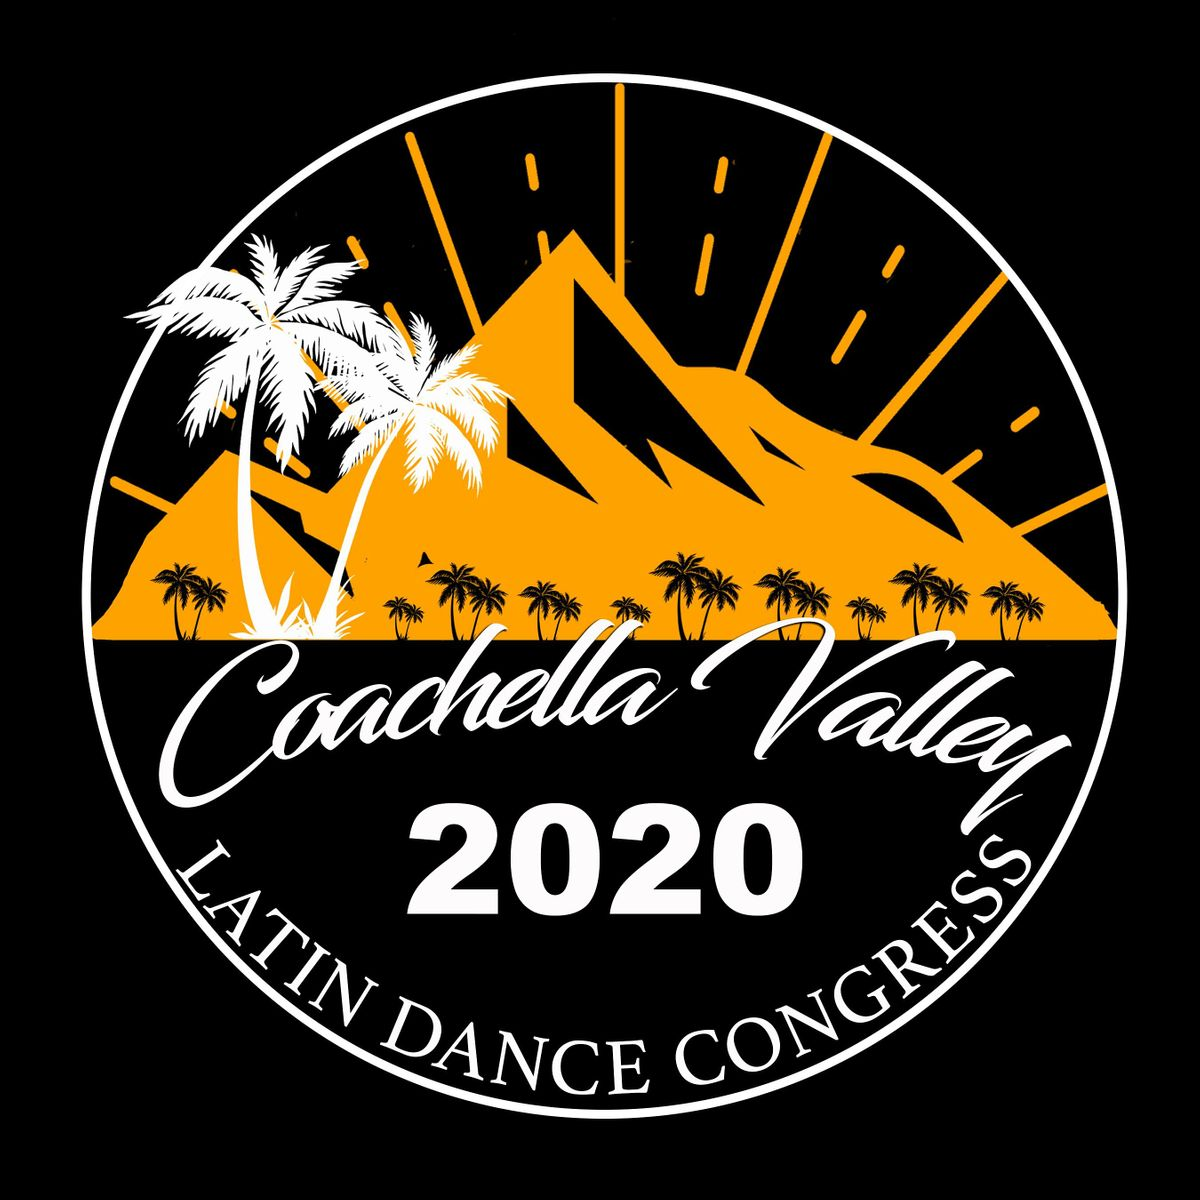 Hotel Congress Halloween 2020 Coachella Valley Latin Dance Congress at DoubleTree by Hilton